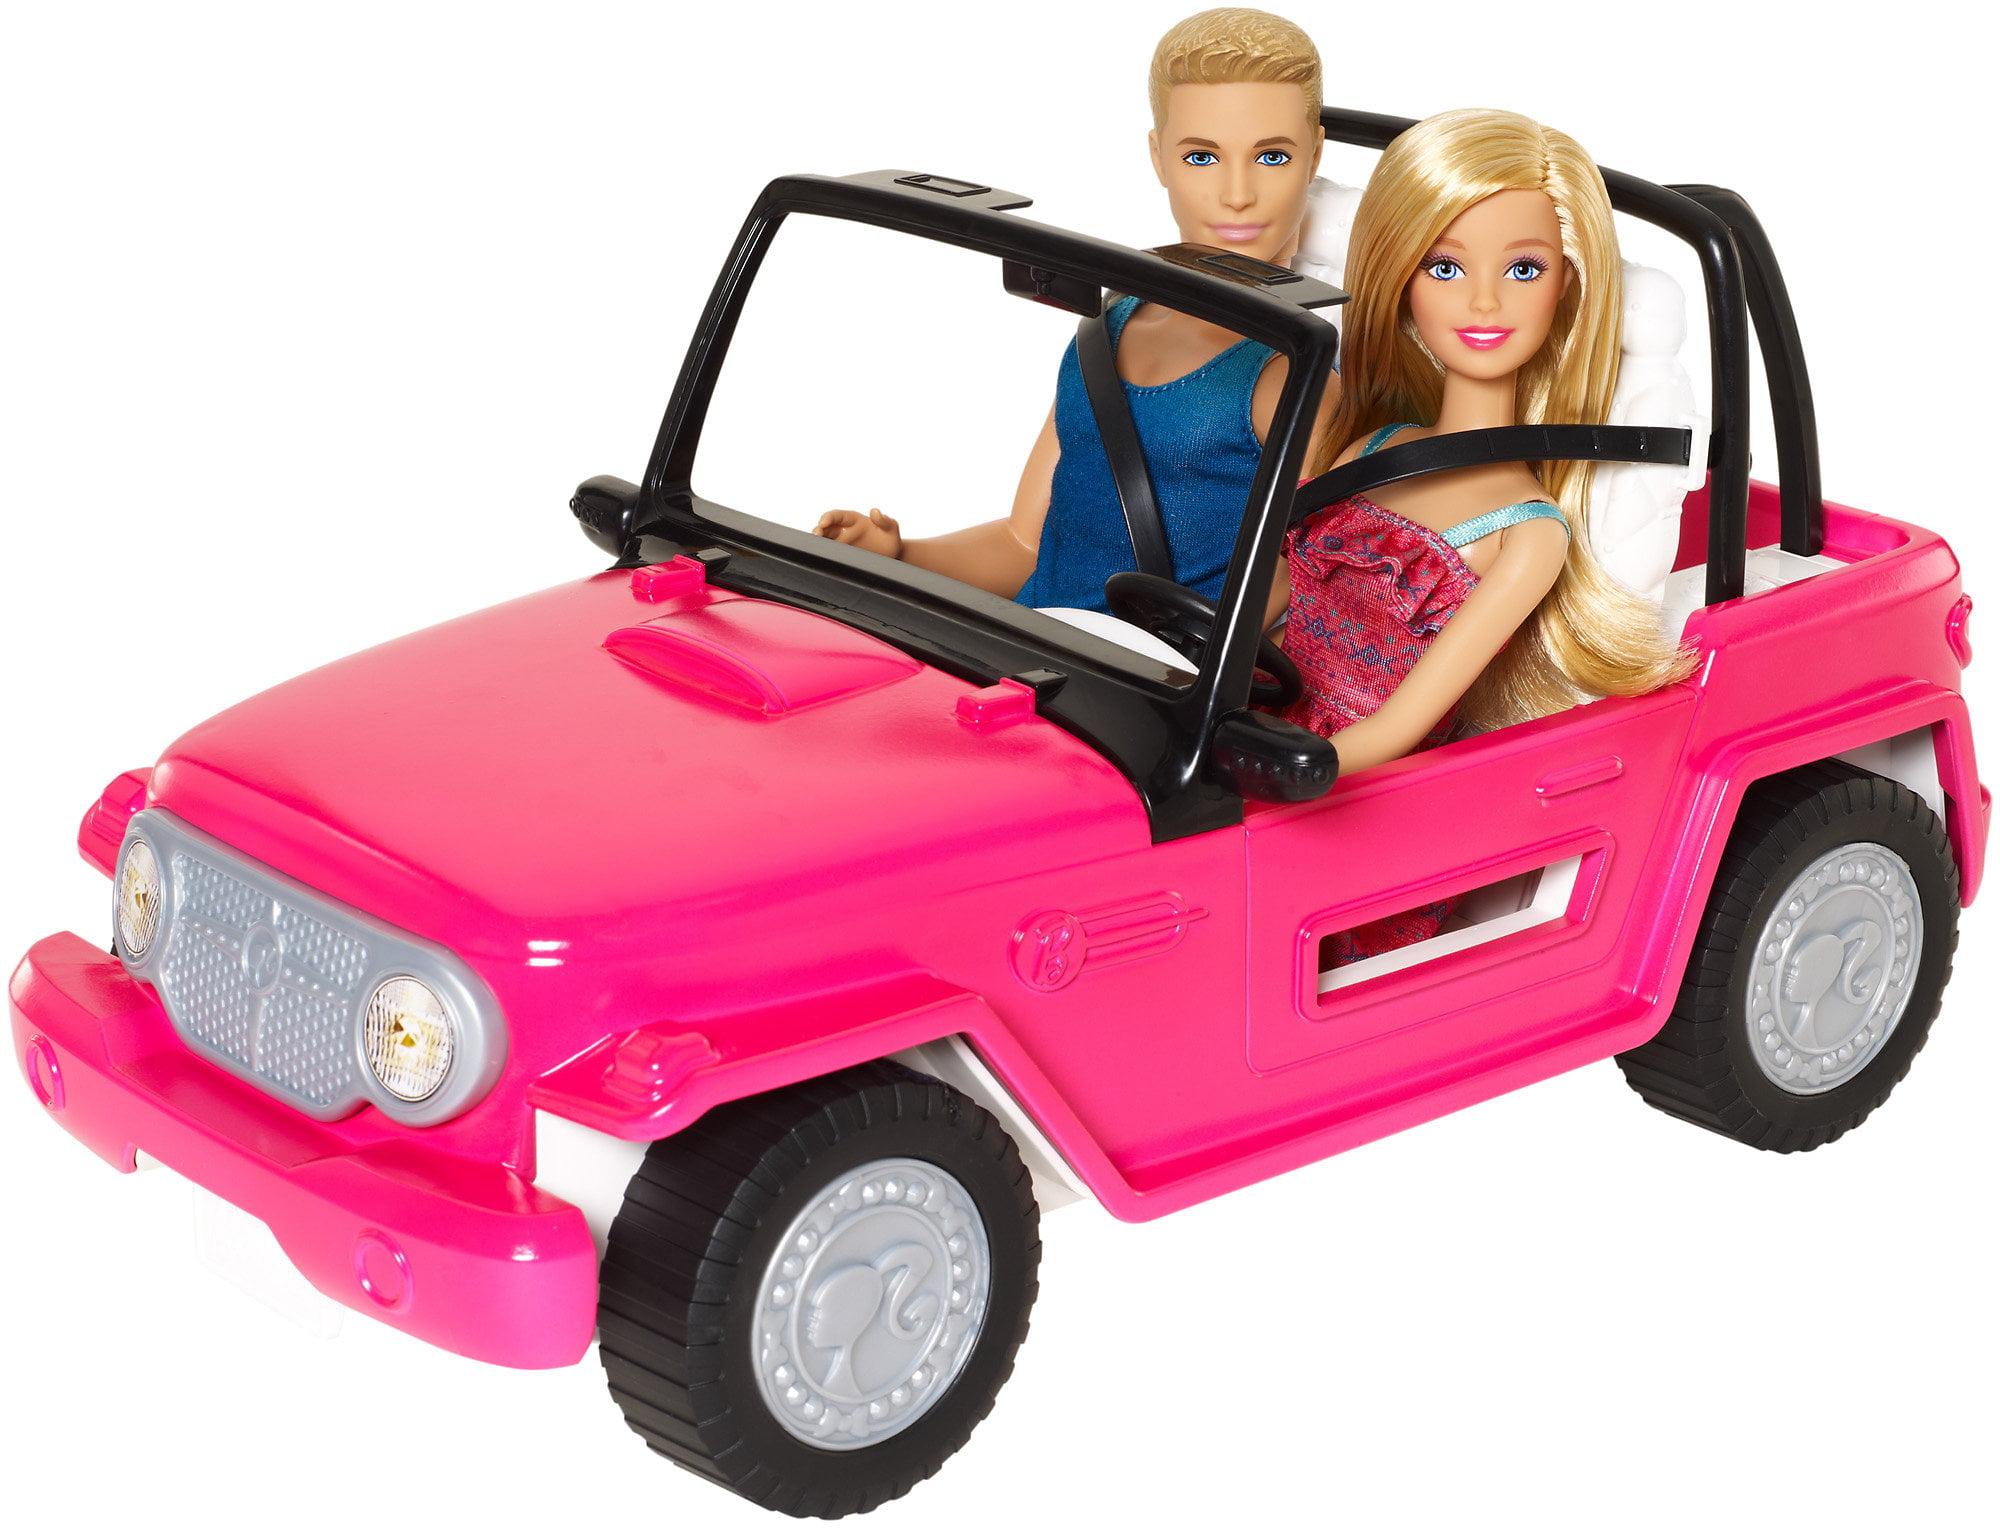 Barbie Beach Cruiser and Ken Doll by Mattel Inc